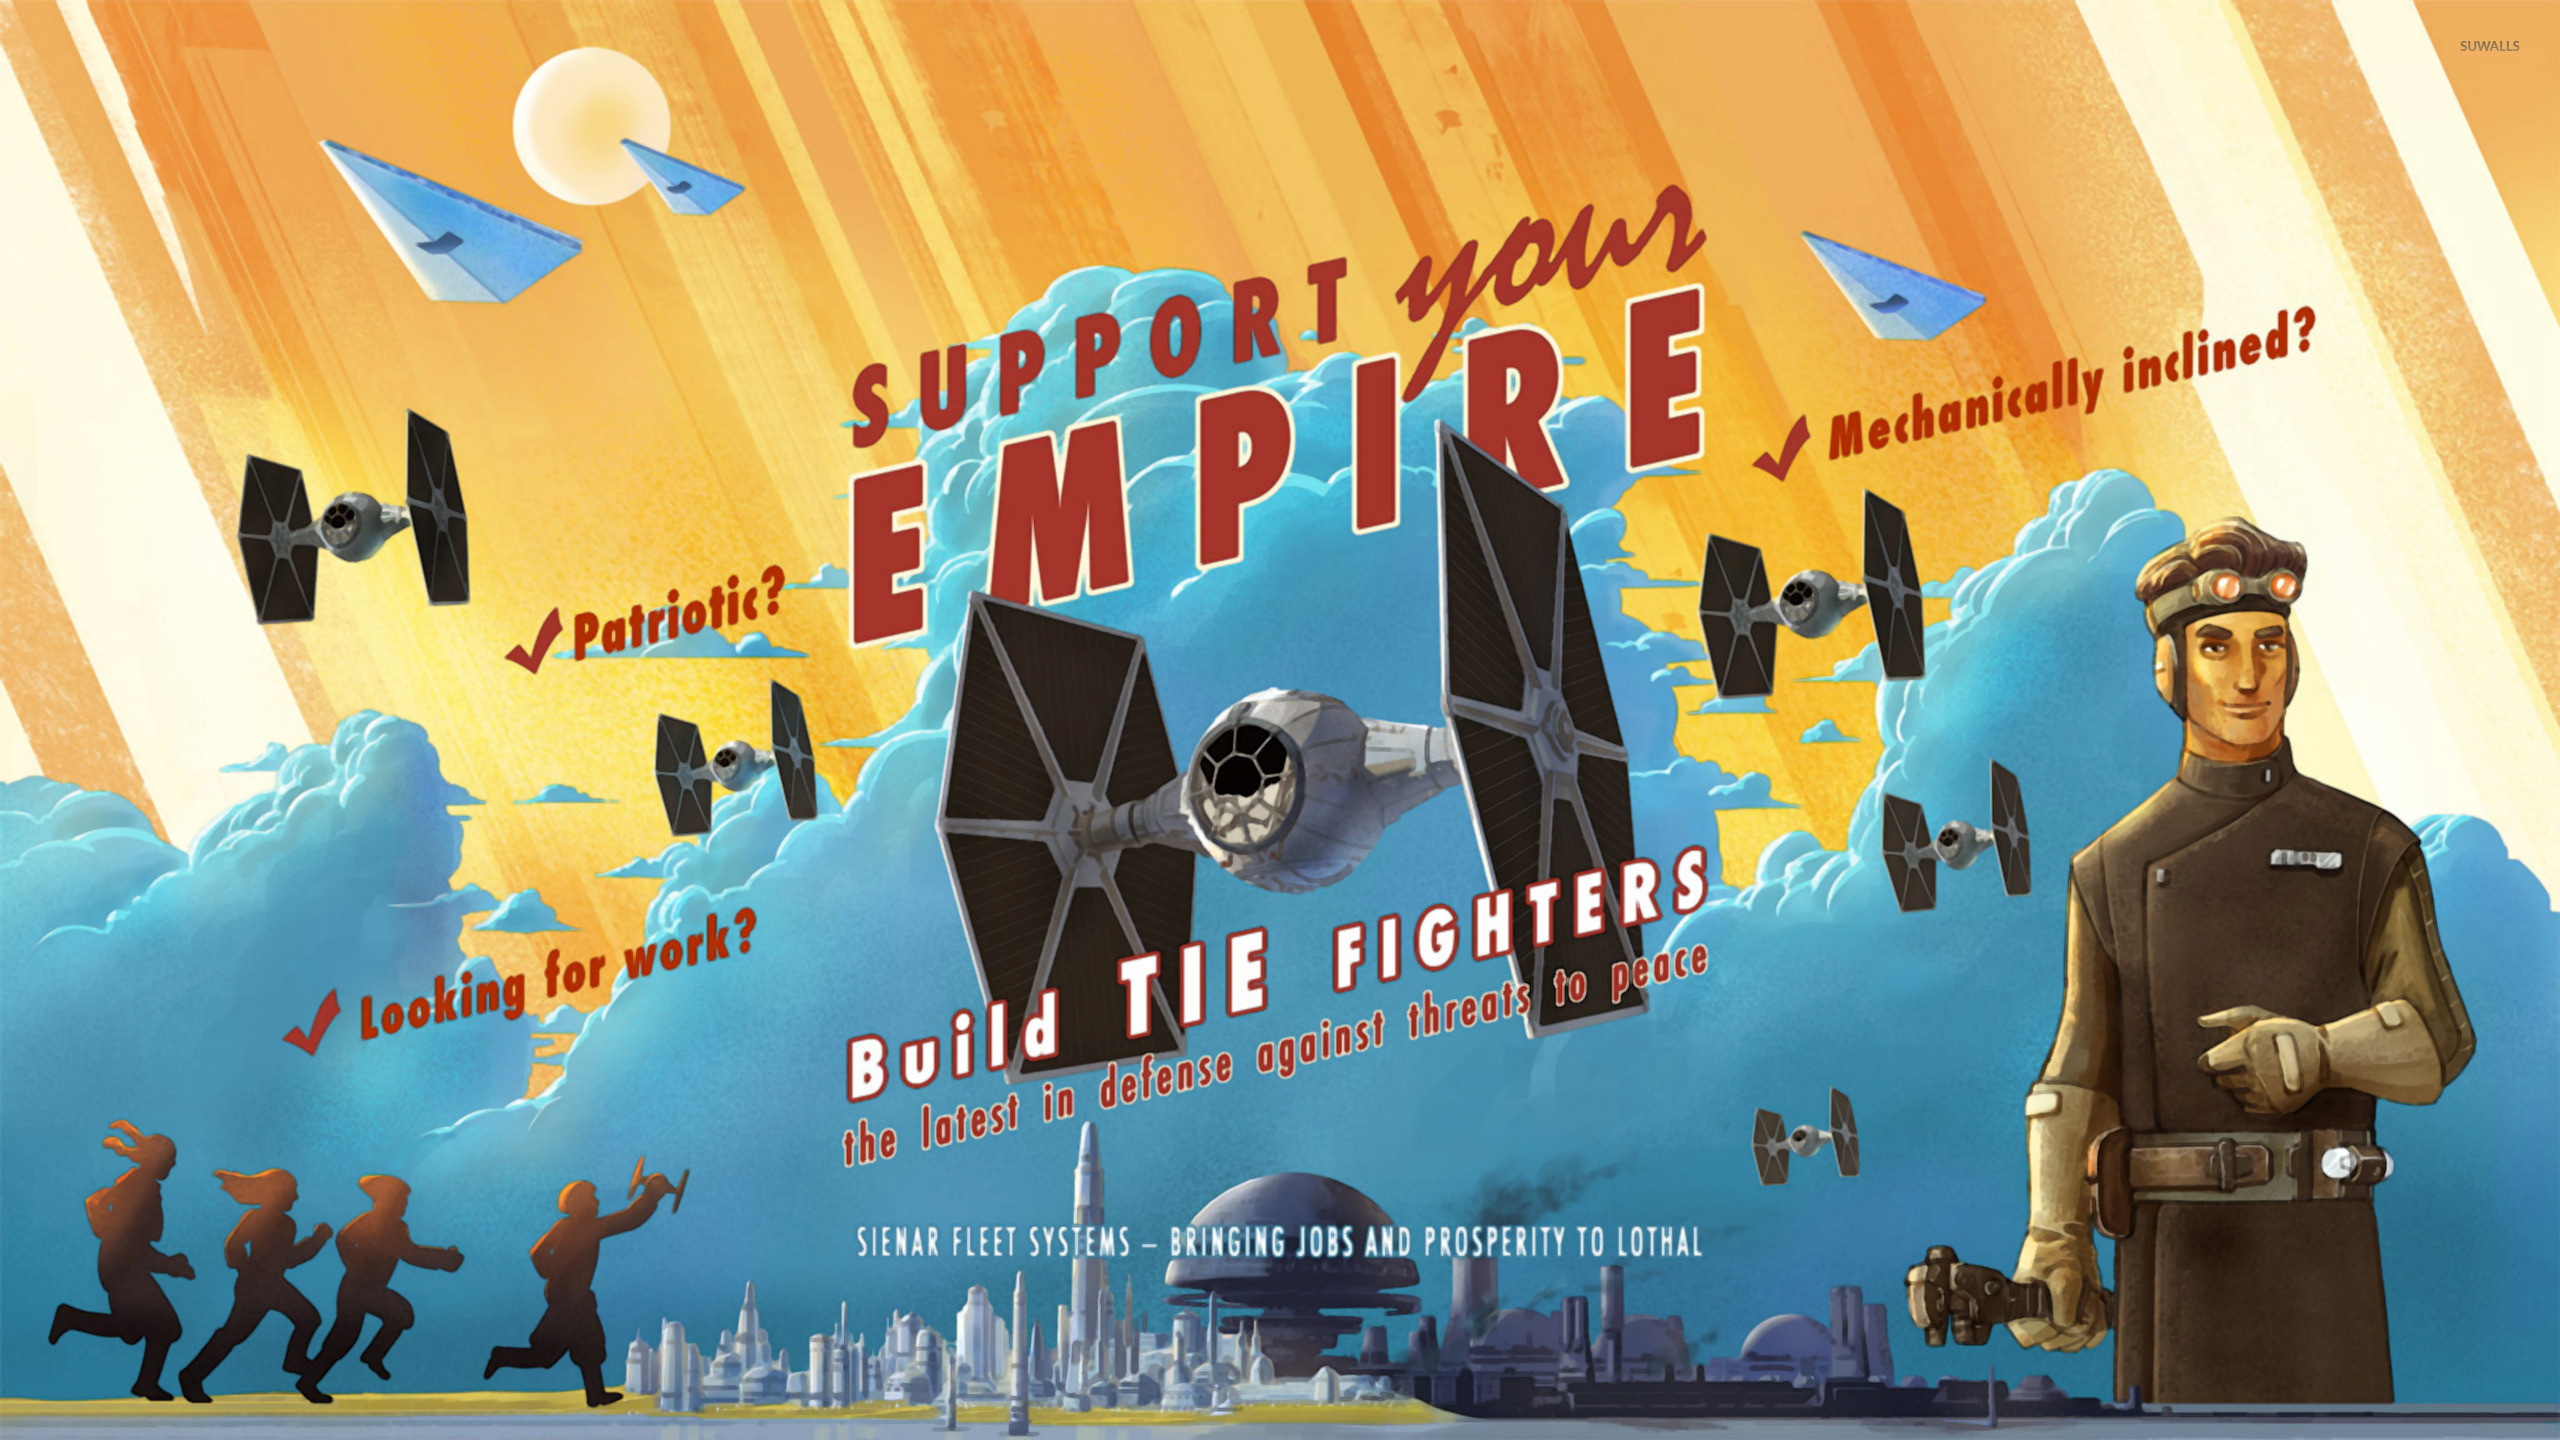 Star Wars Rebels propaganda poster wallpaper jpg